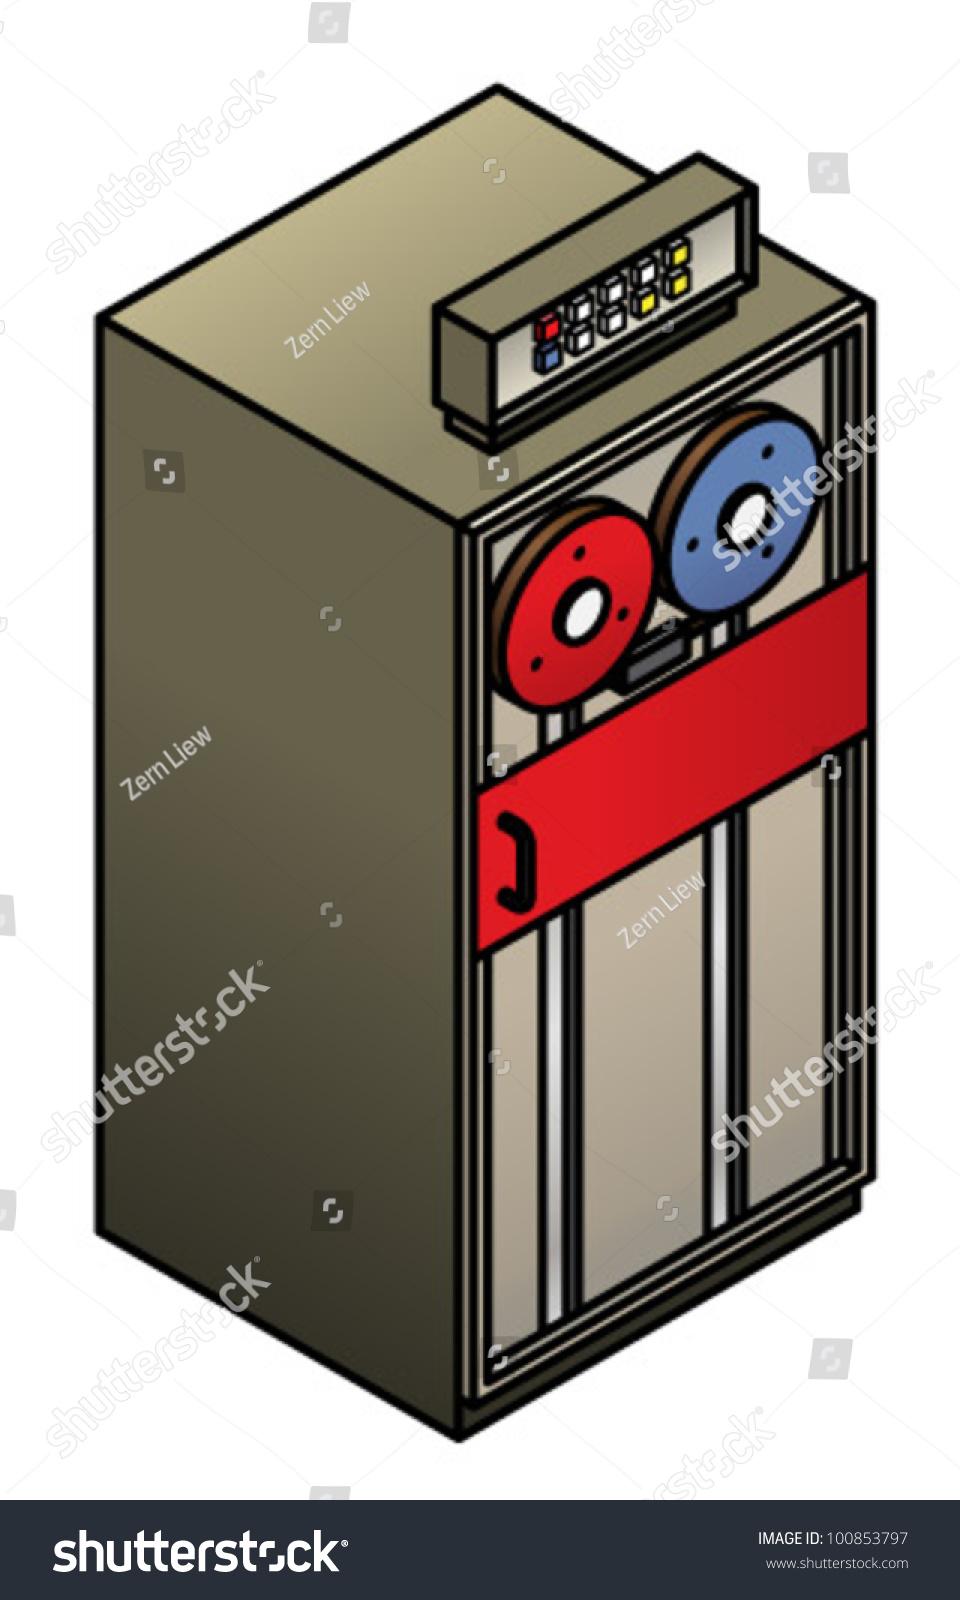 Vintage Computing Tape Drive เวกเตอร์สต็อก (ปลอดค่าลิขสิทธิ์